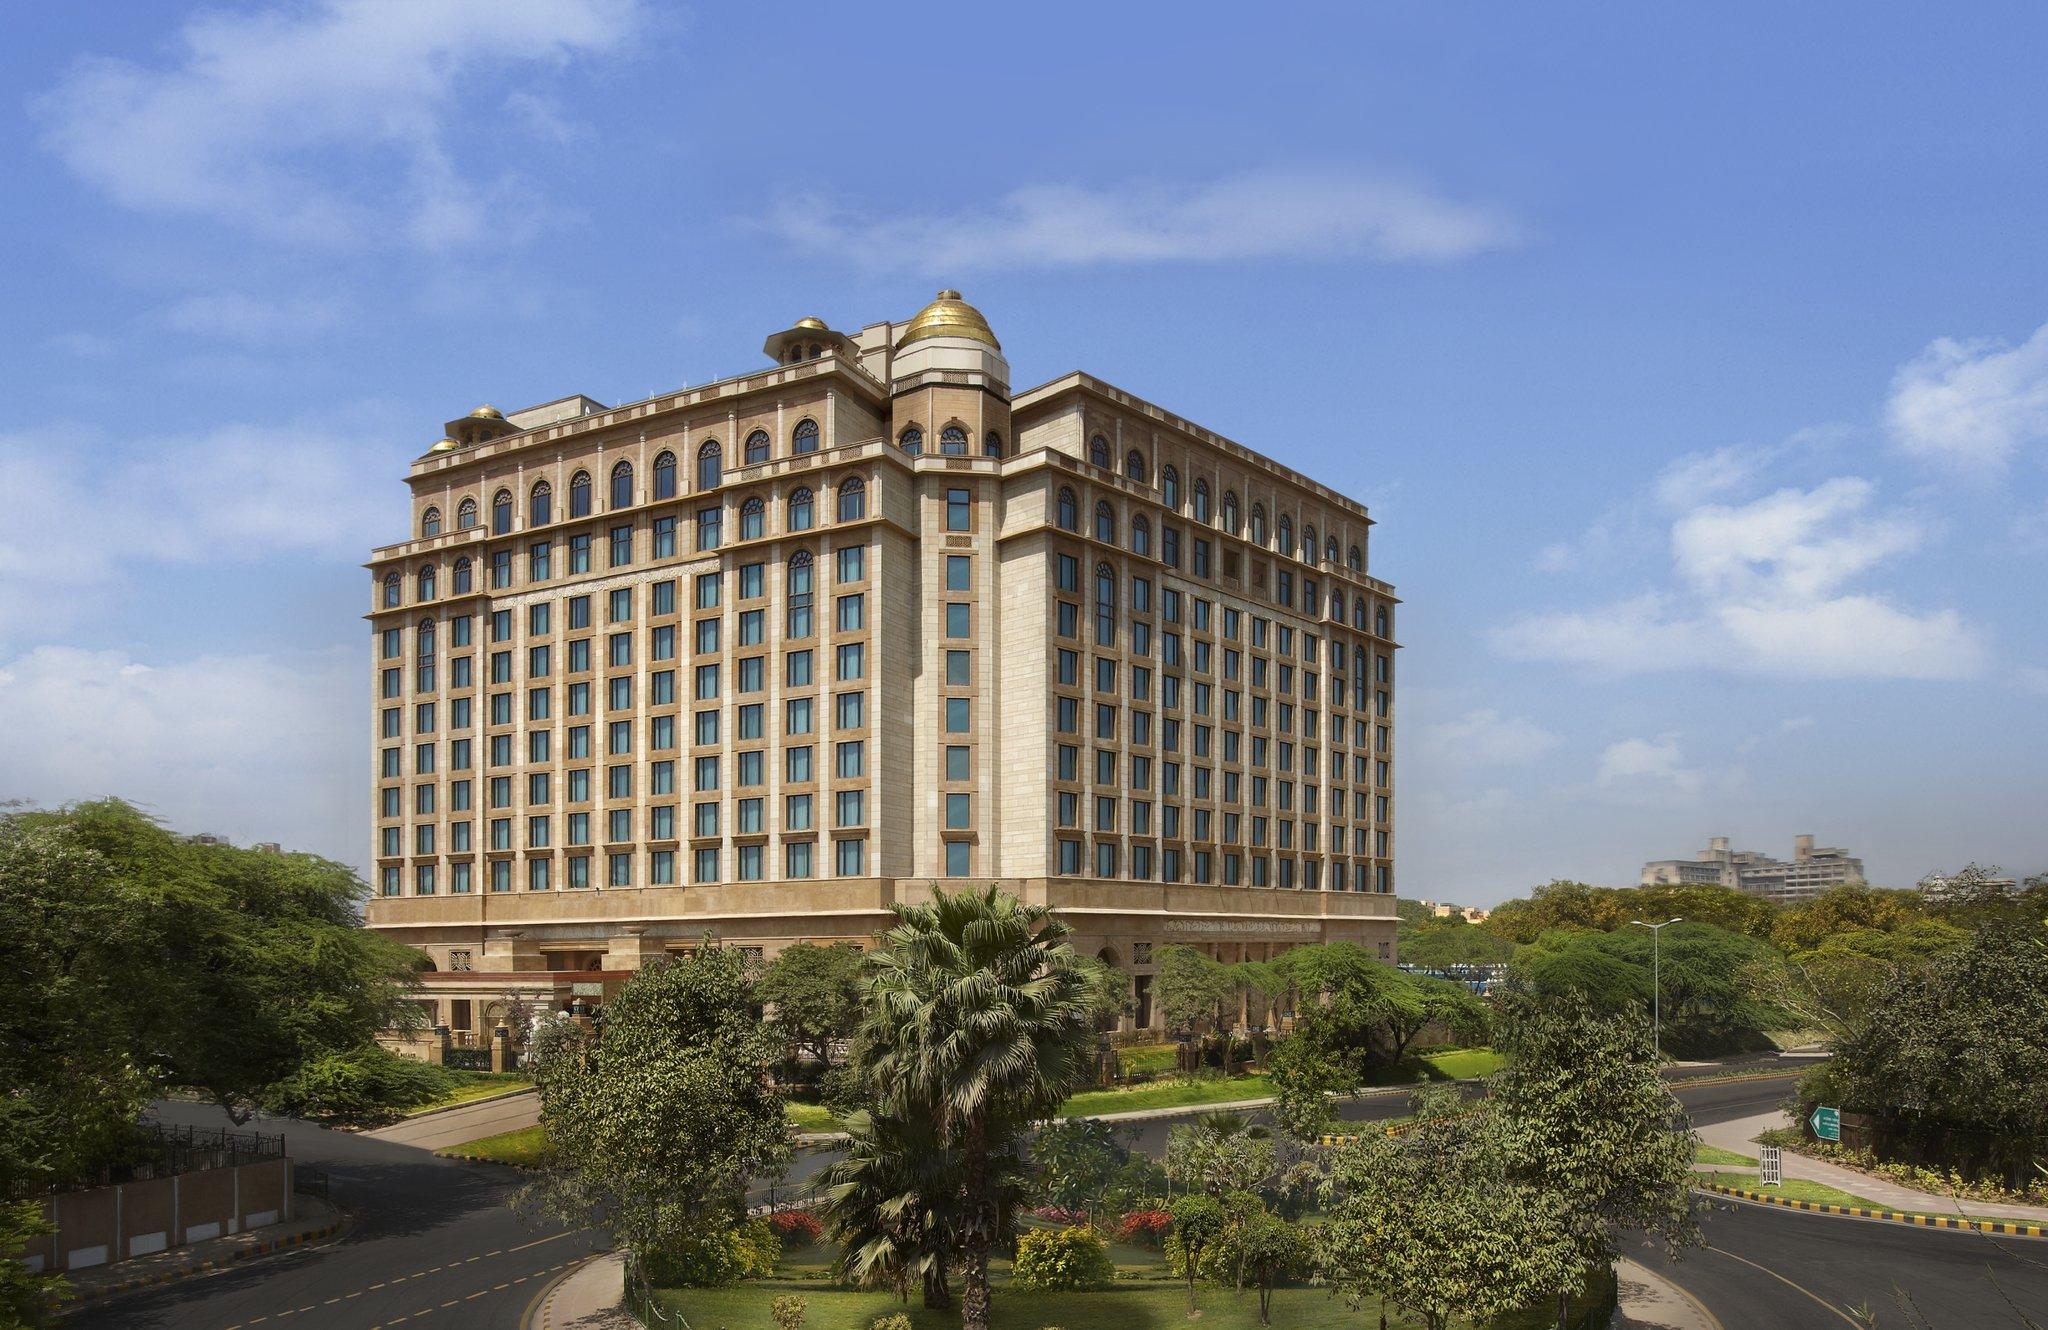 Enjoy Palatial Comfort At The Leela Palace New Delhi Sagmart